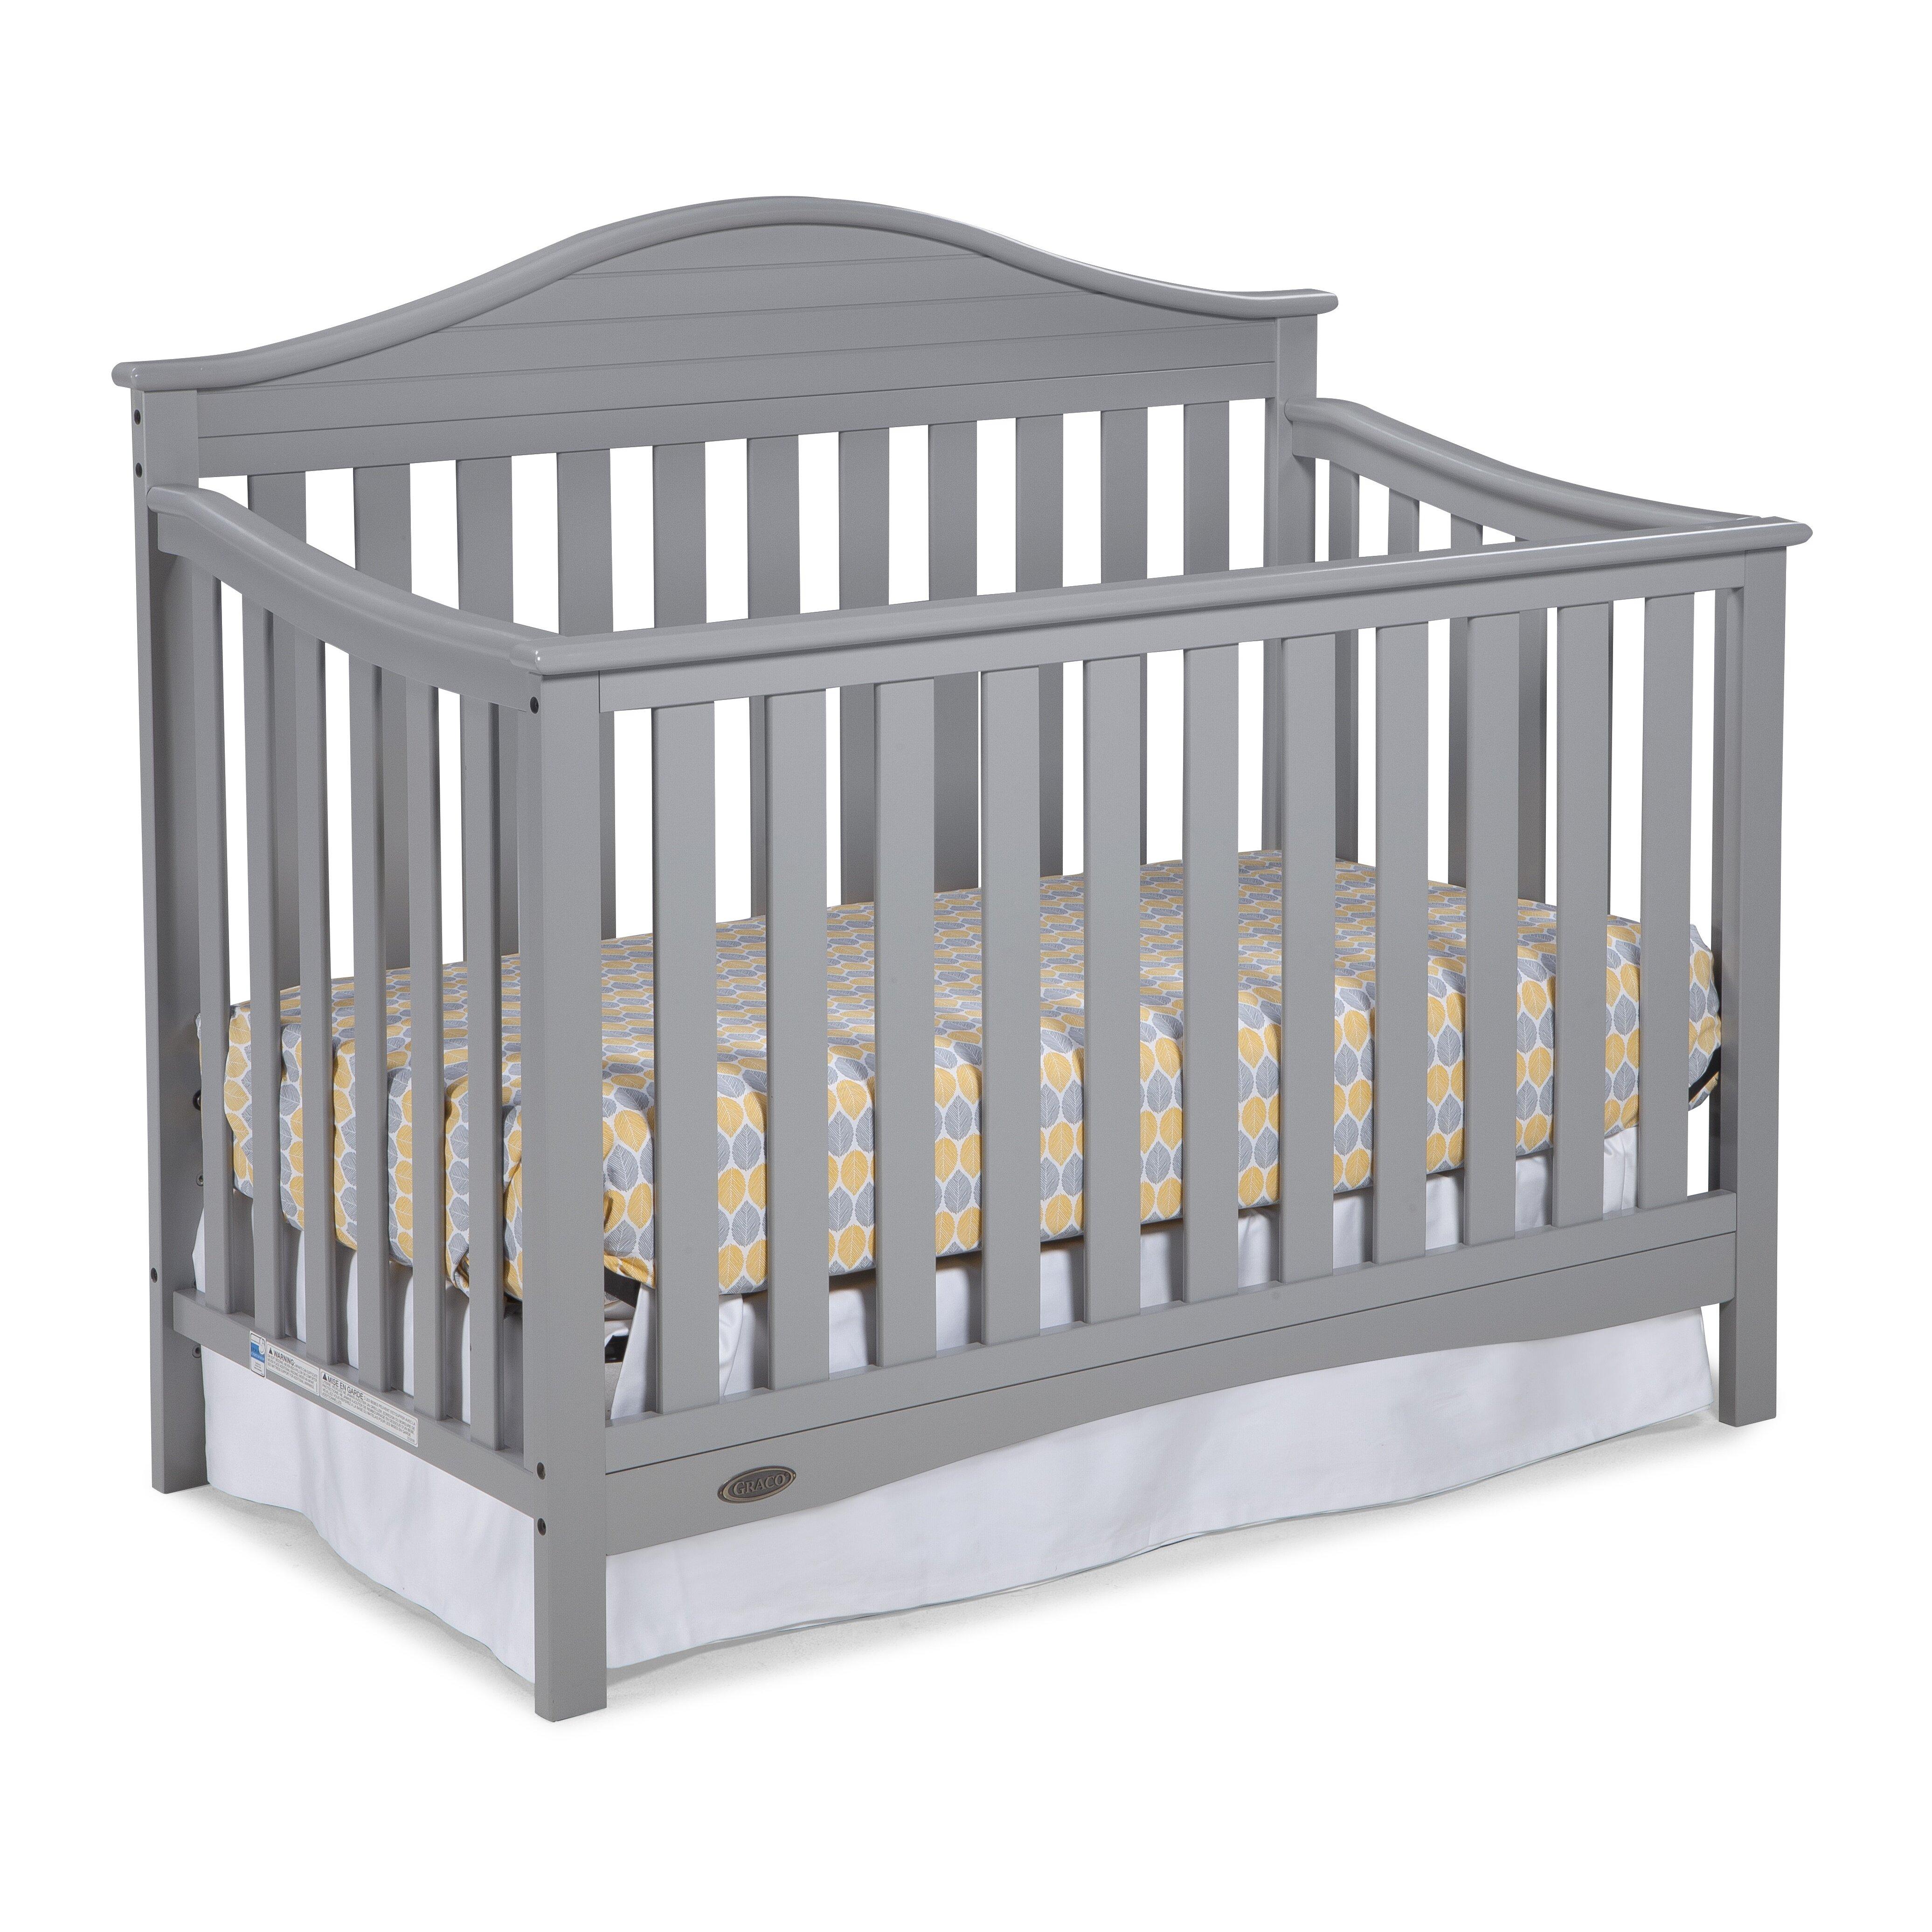 Baby cribs nashville tn - Graco Harbor Lights 4 In 1 Convertible Crib